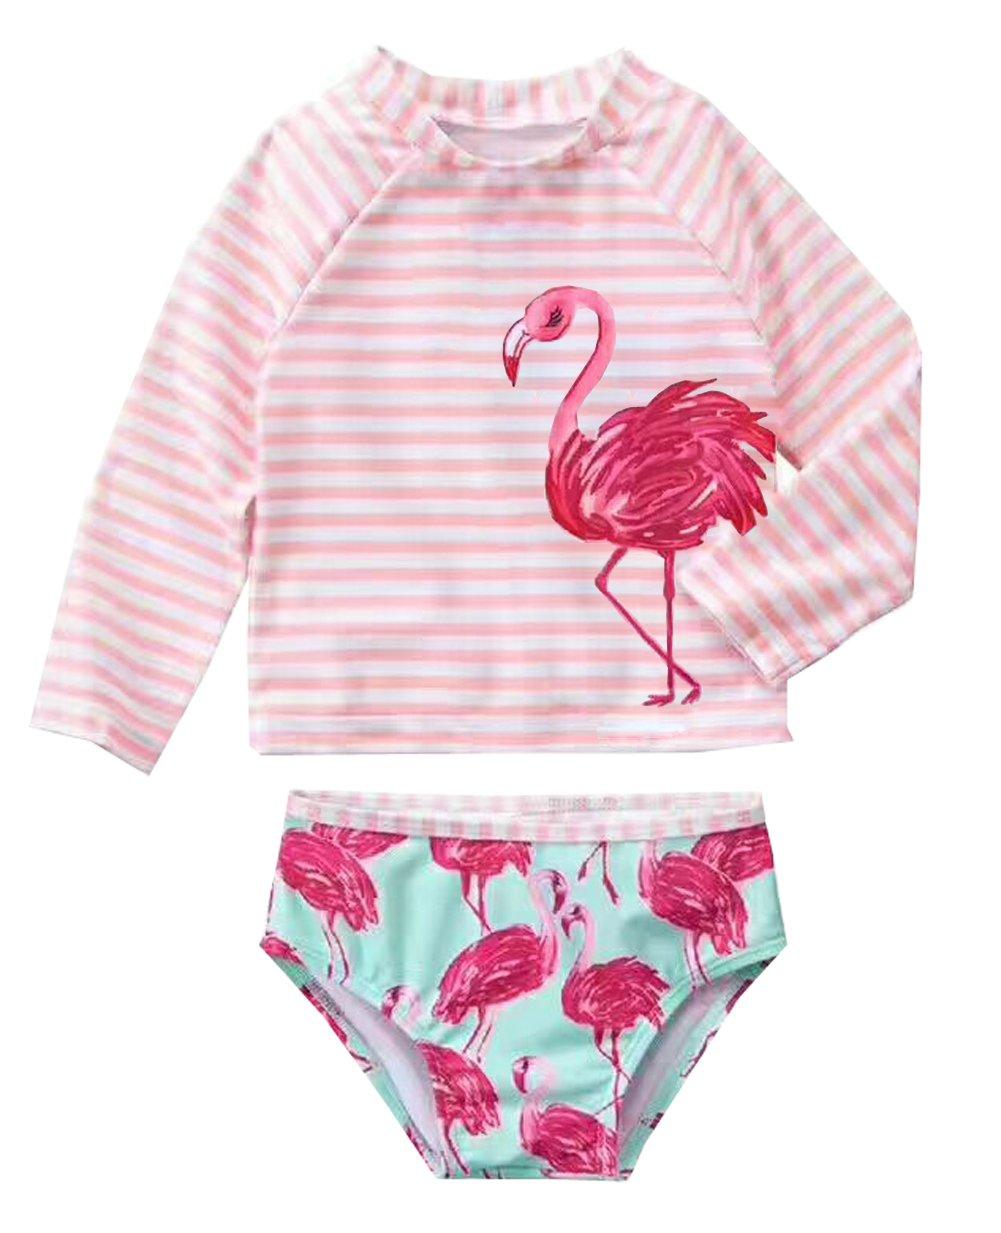 Baby Little Girls Swimwear Fish Swimsuit Tankinis Two Piece Rash Guard Set